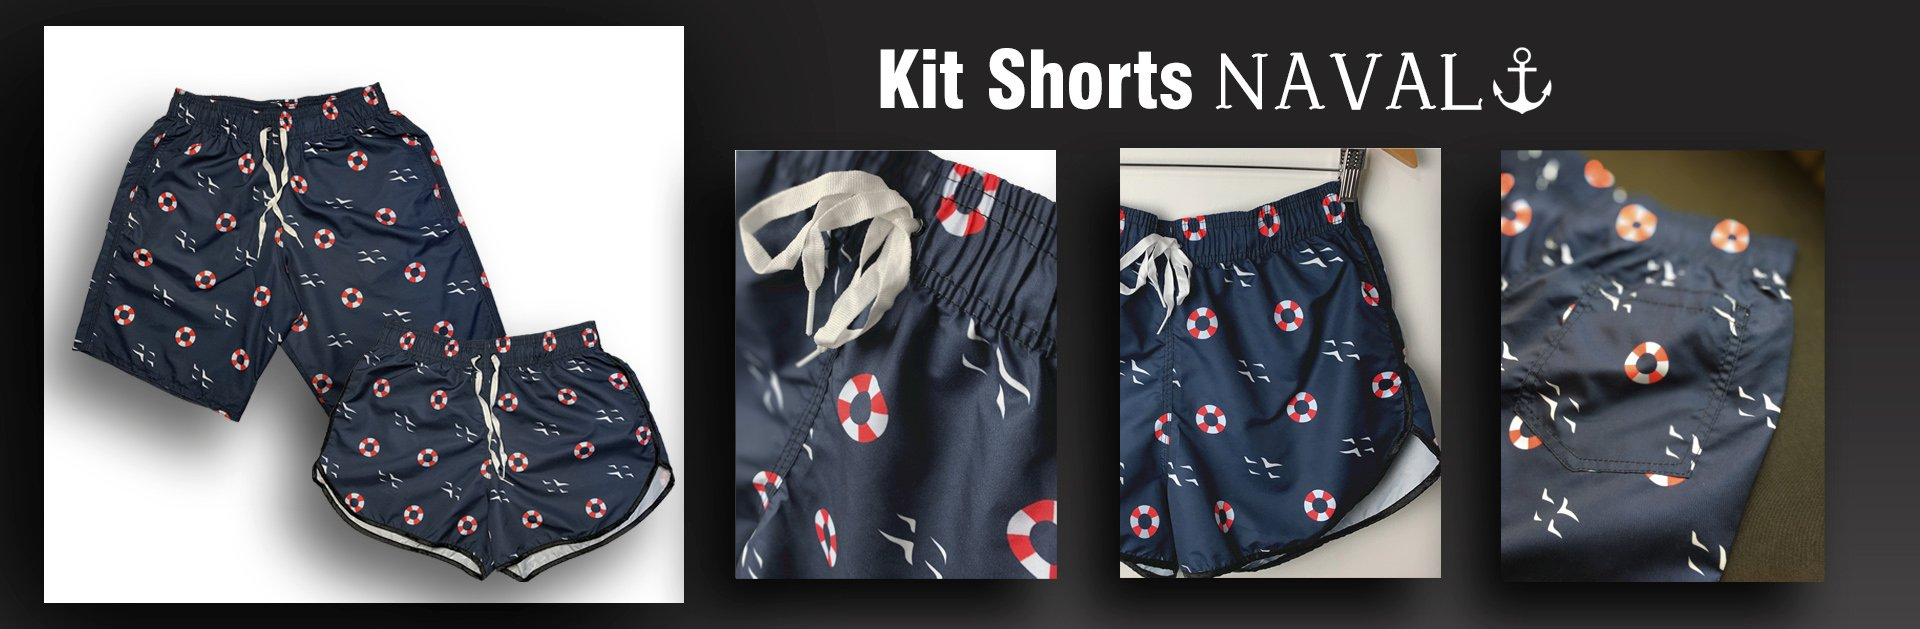 Shorts Naval